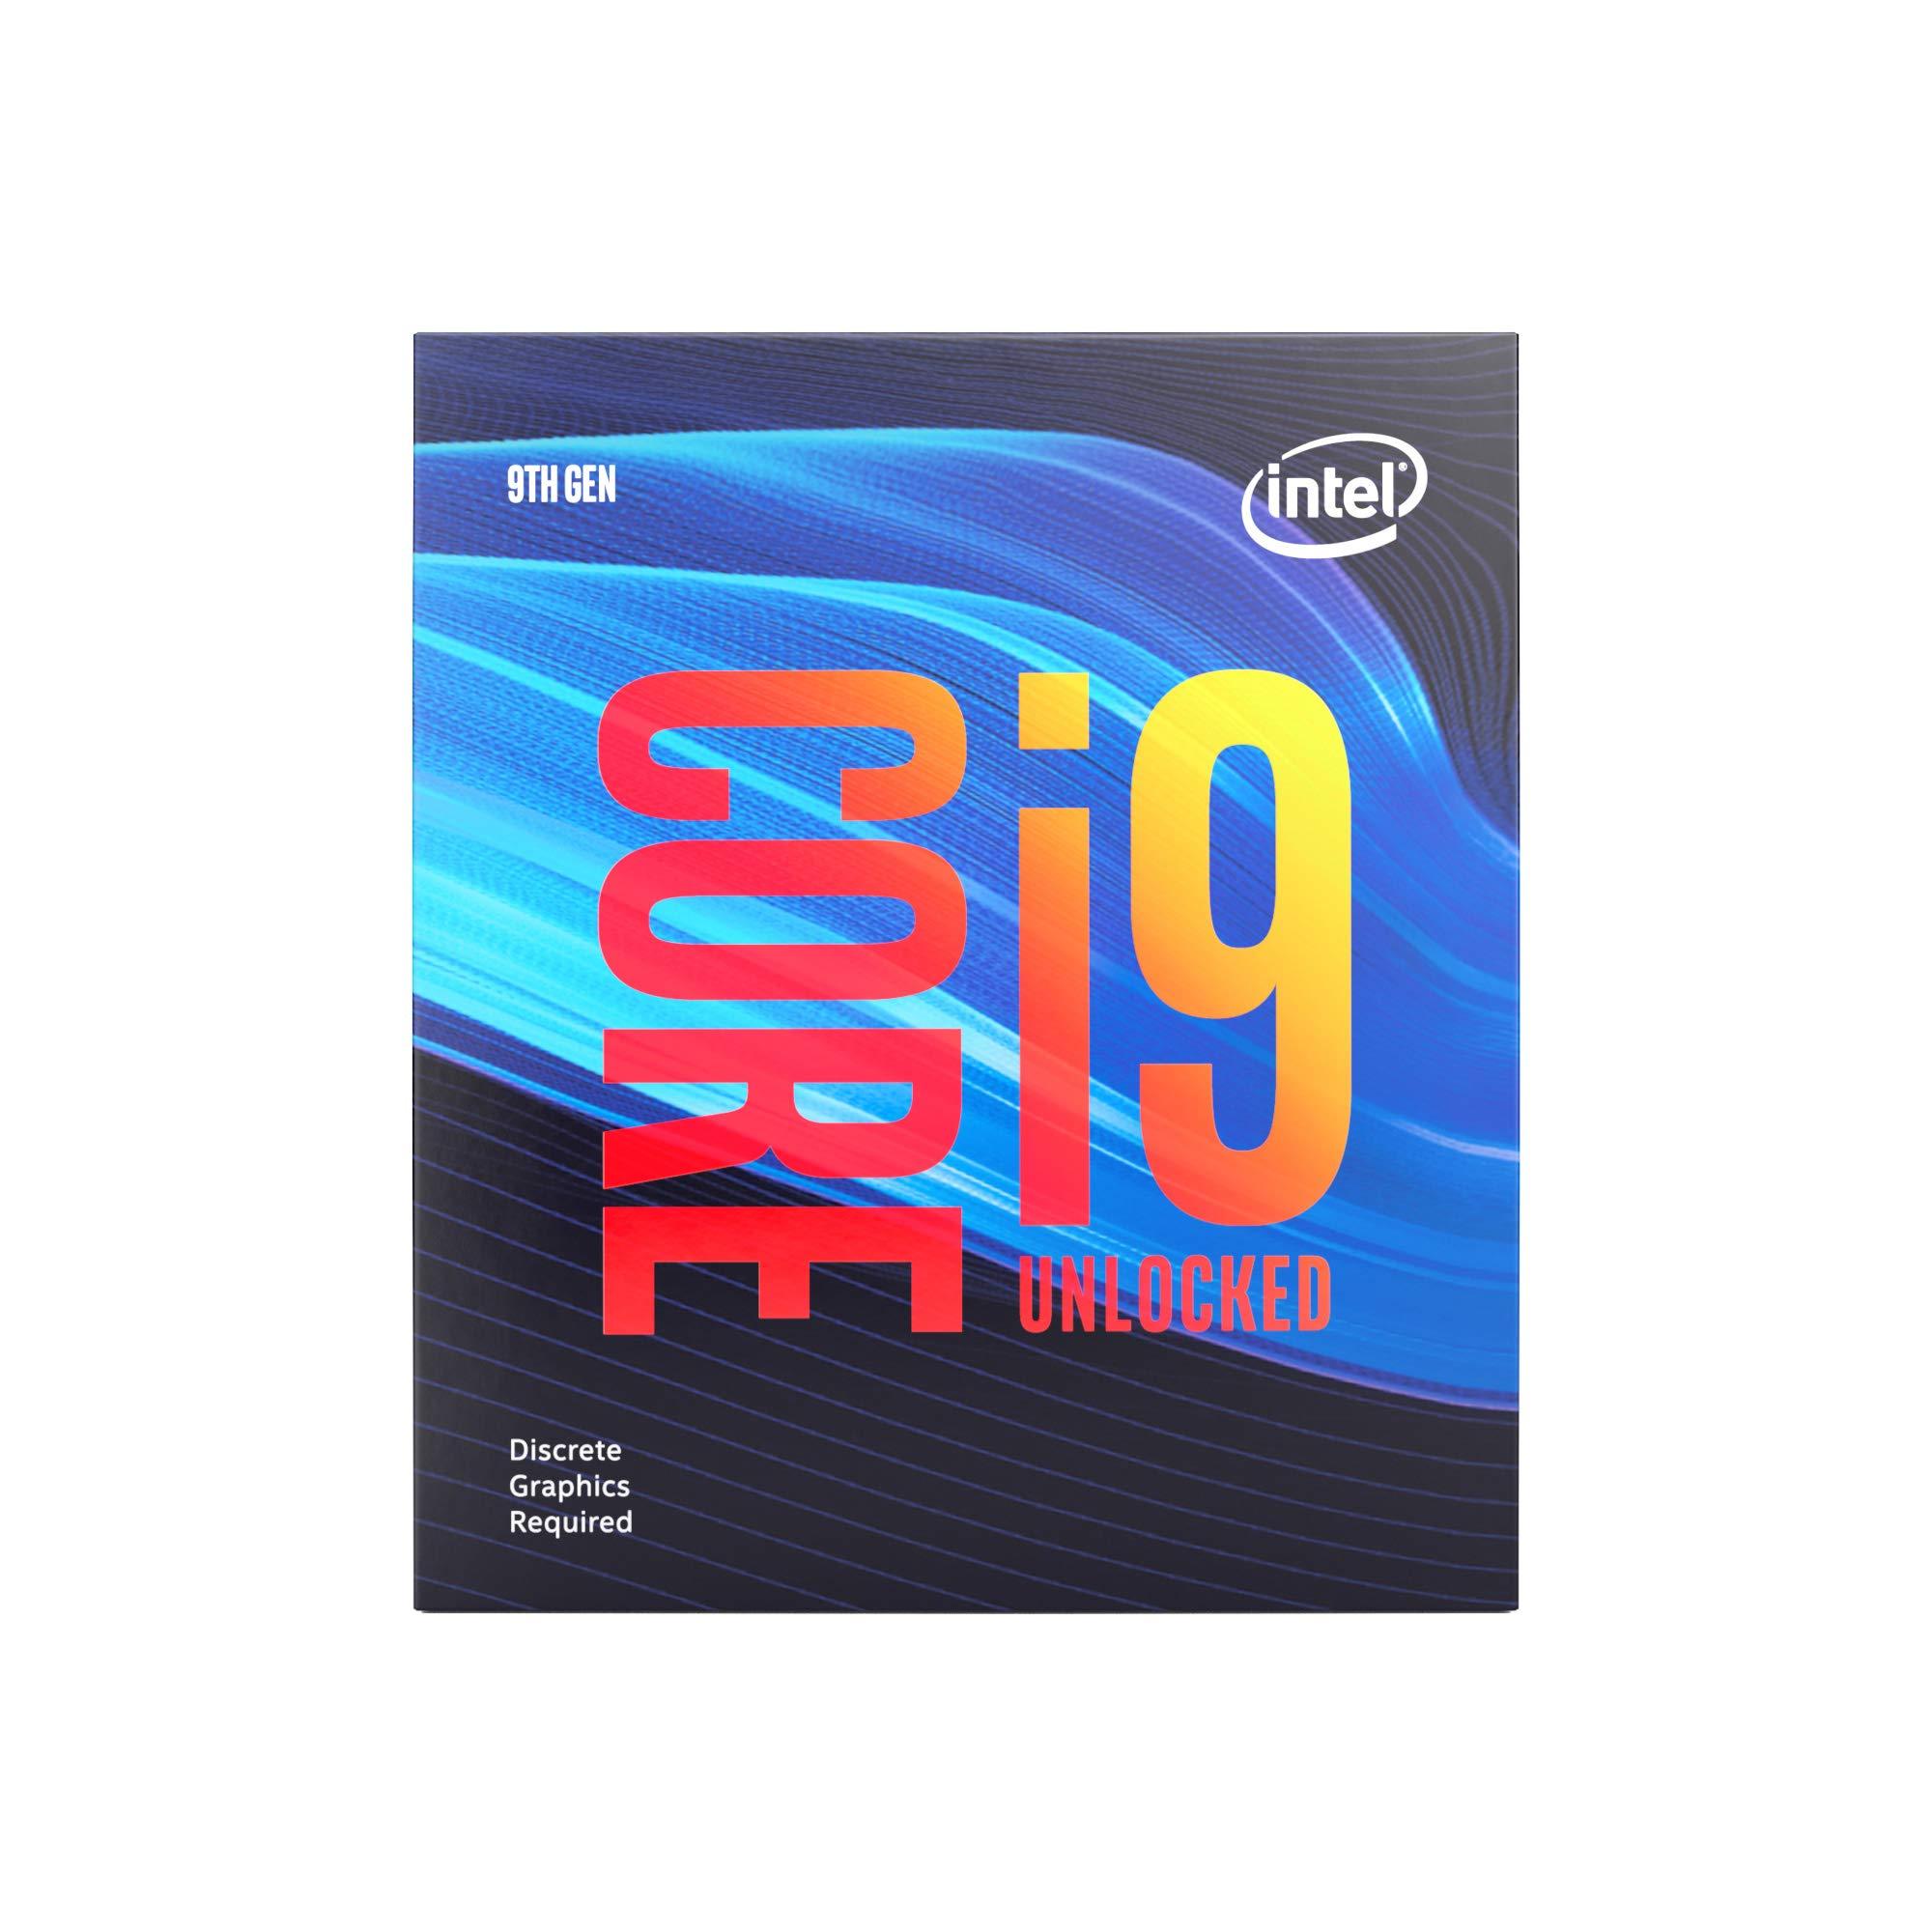 Intel BX80684I99900KF Intel Core i9-9900KF Desktop Processor 8 Cores up to 5.0 GHz Turbo Unlocked Without Processor Graphics LGA1151 300 Series 95W by Intel